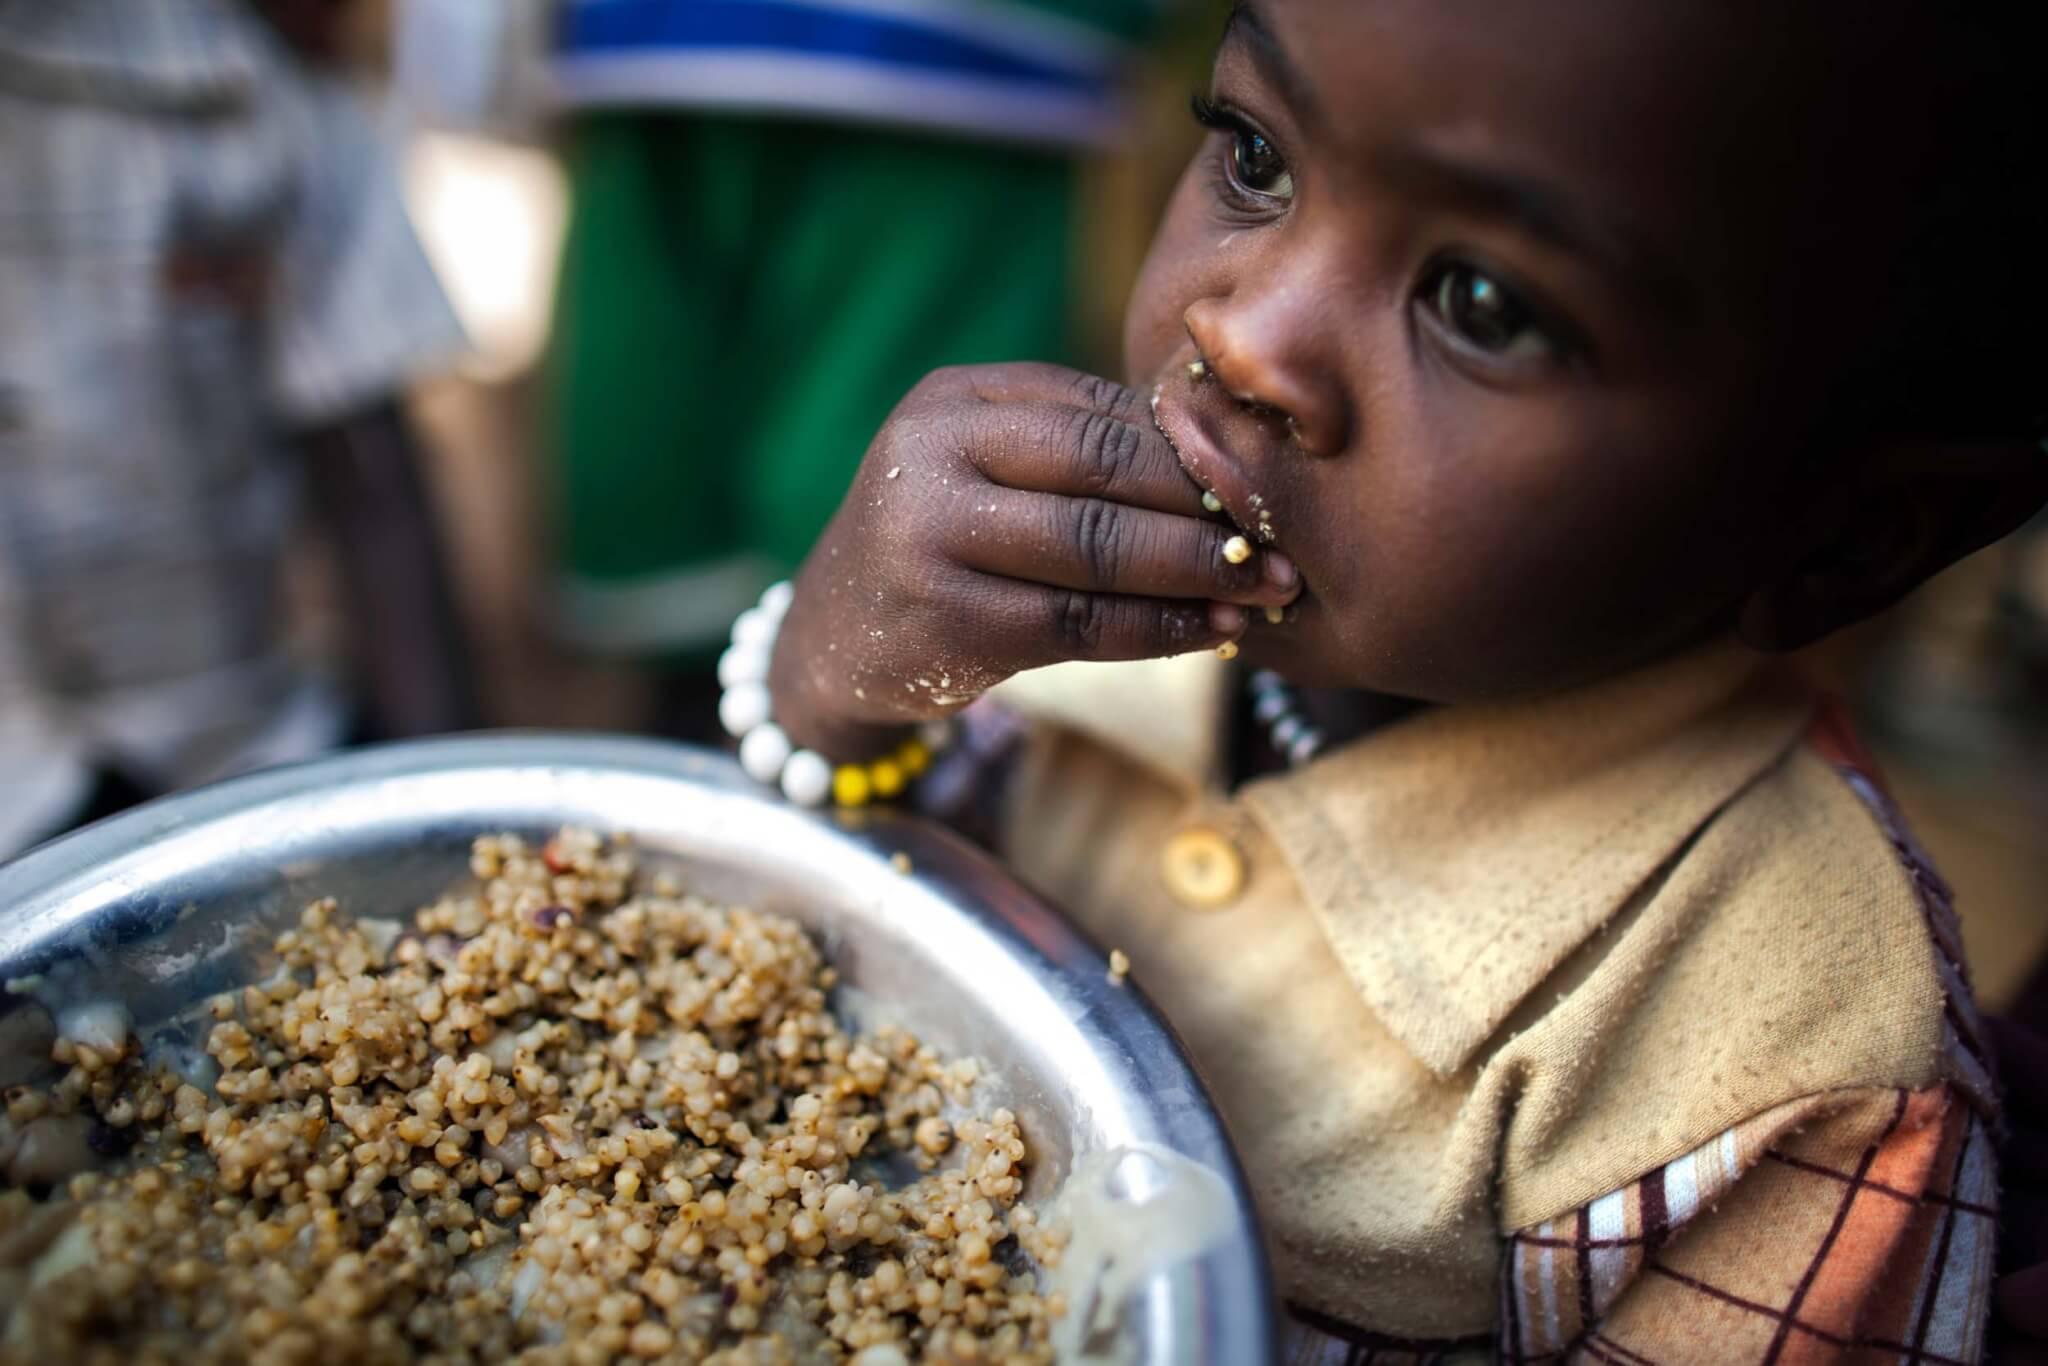 A child eats lentils in a food distribution centre, Rwanda